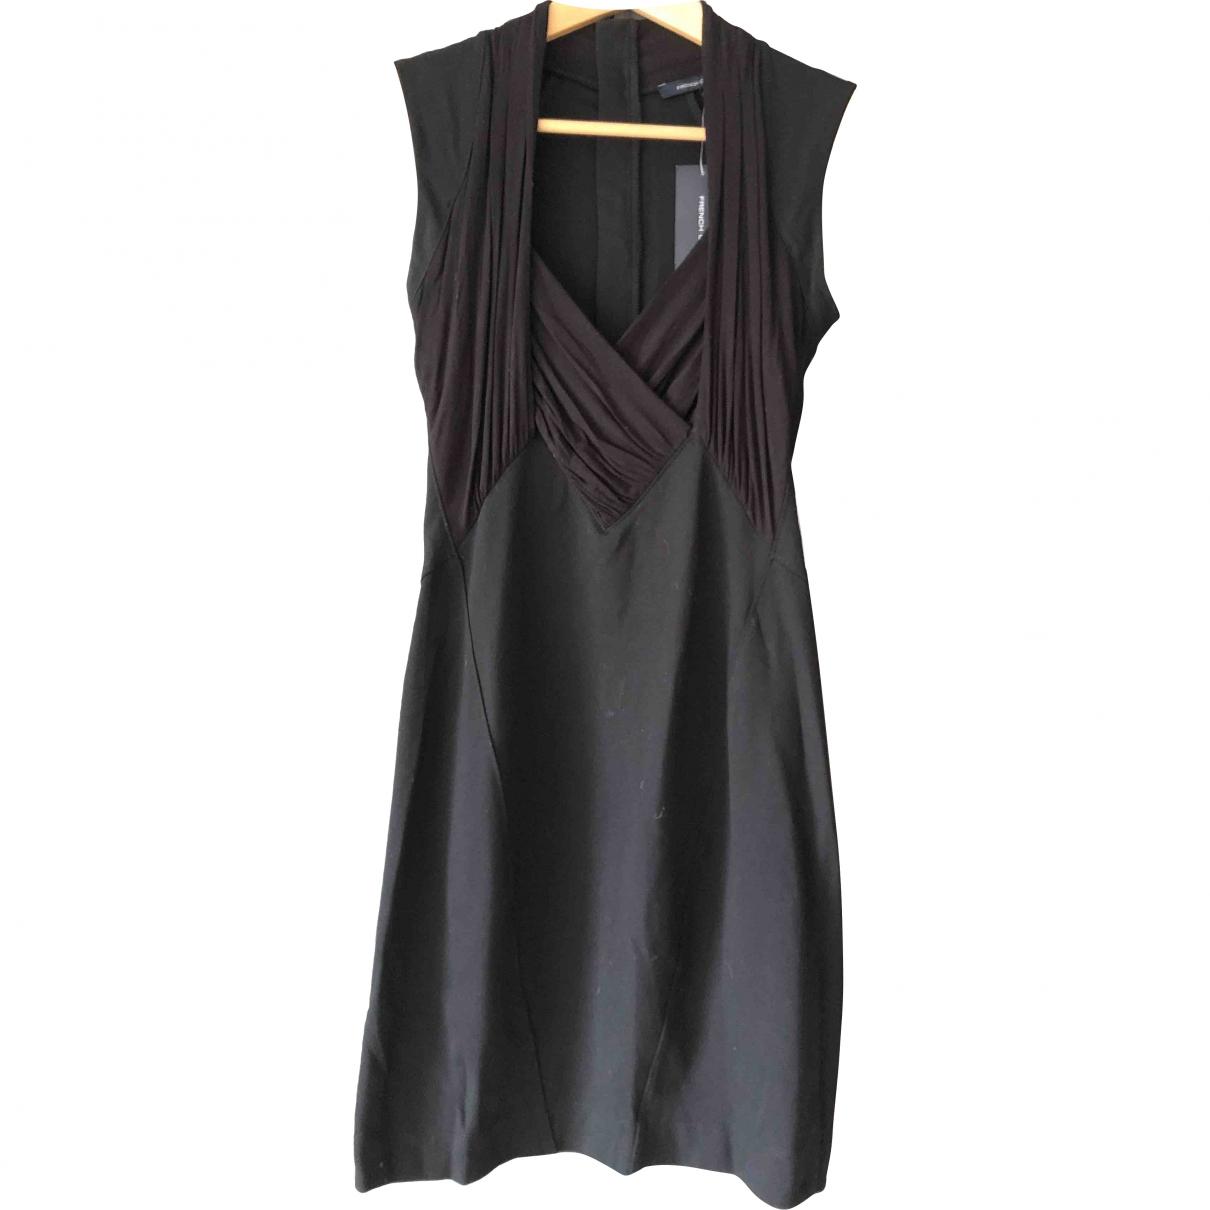 French Connection \N Kleid in  Schwarz Baumwolle - Elasthan